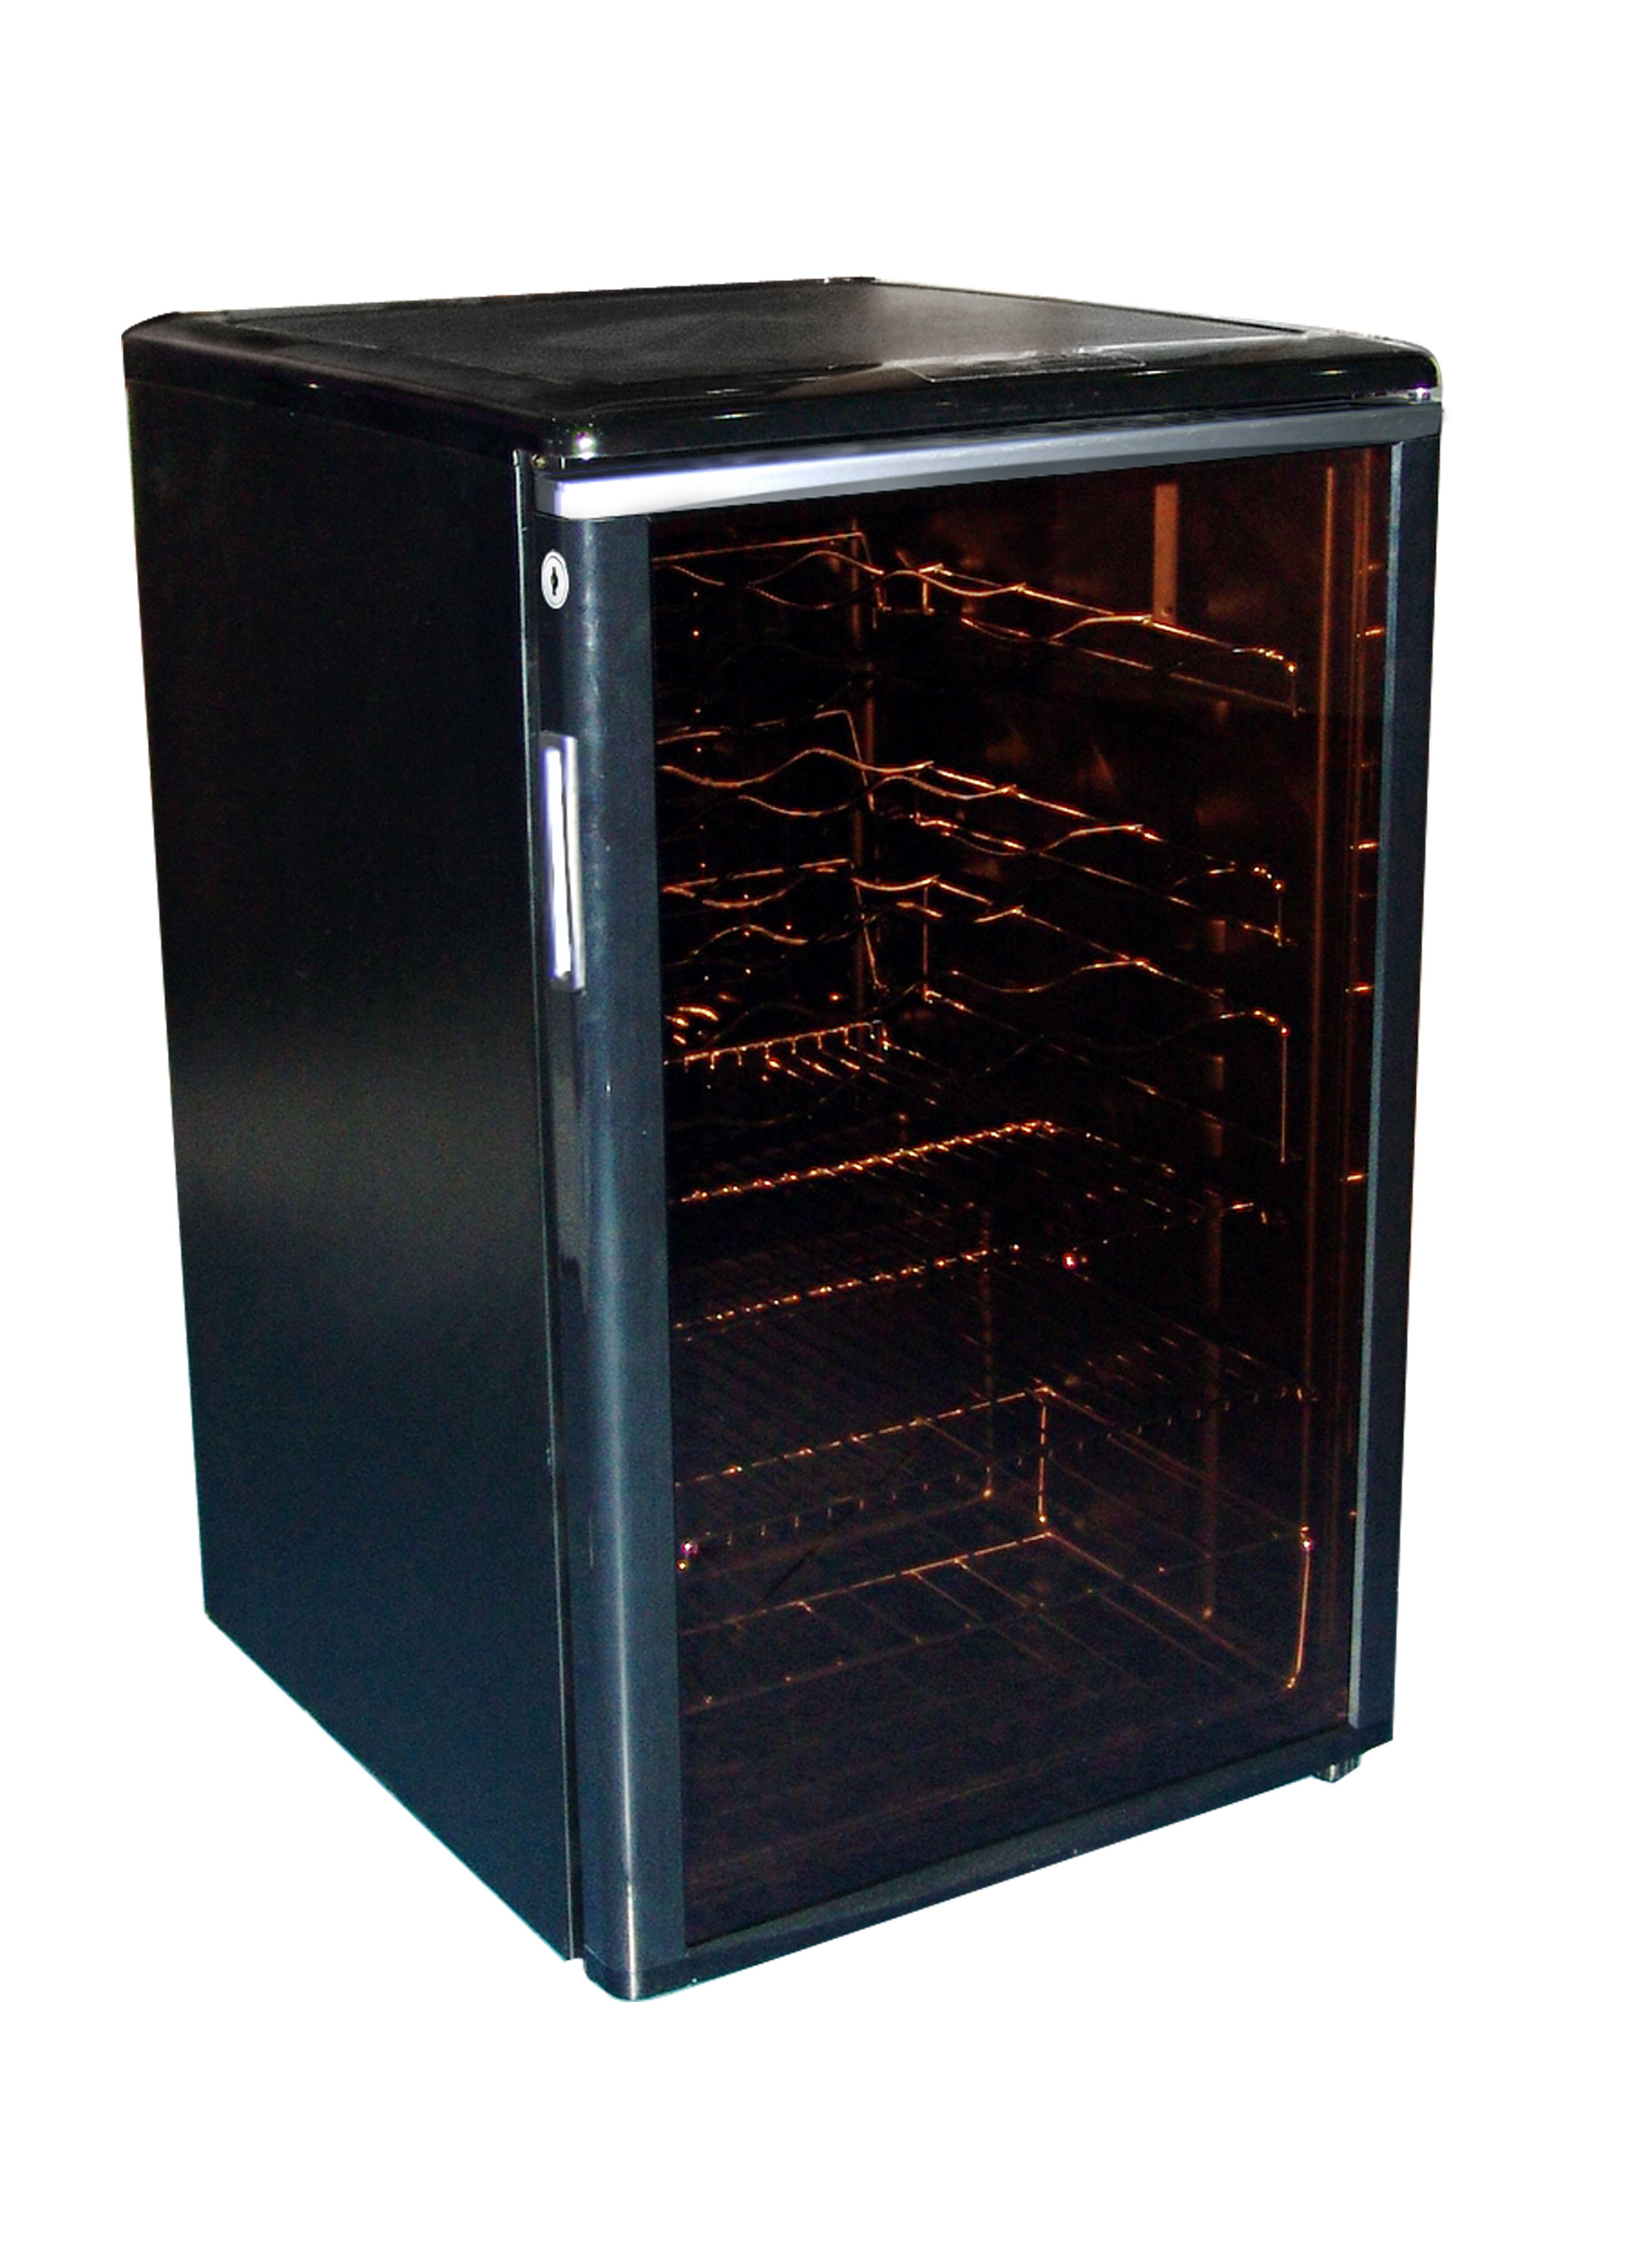 46 BOTTLE WINE COOLER ELECTRONIC TEMPERATURE CONTROL